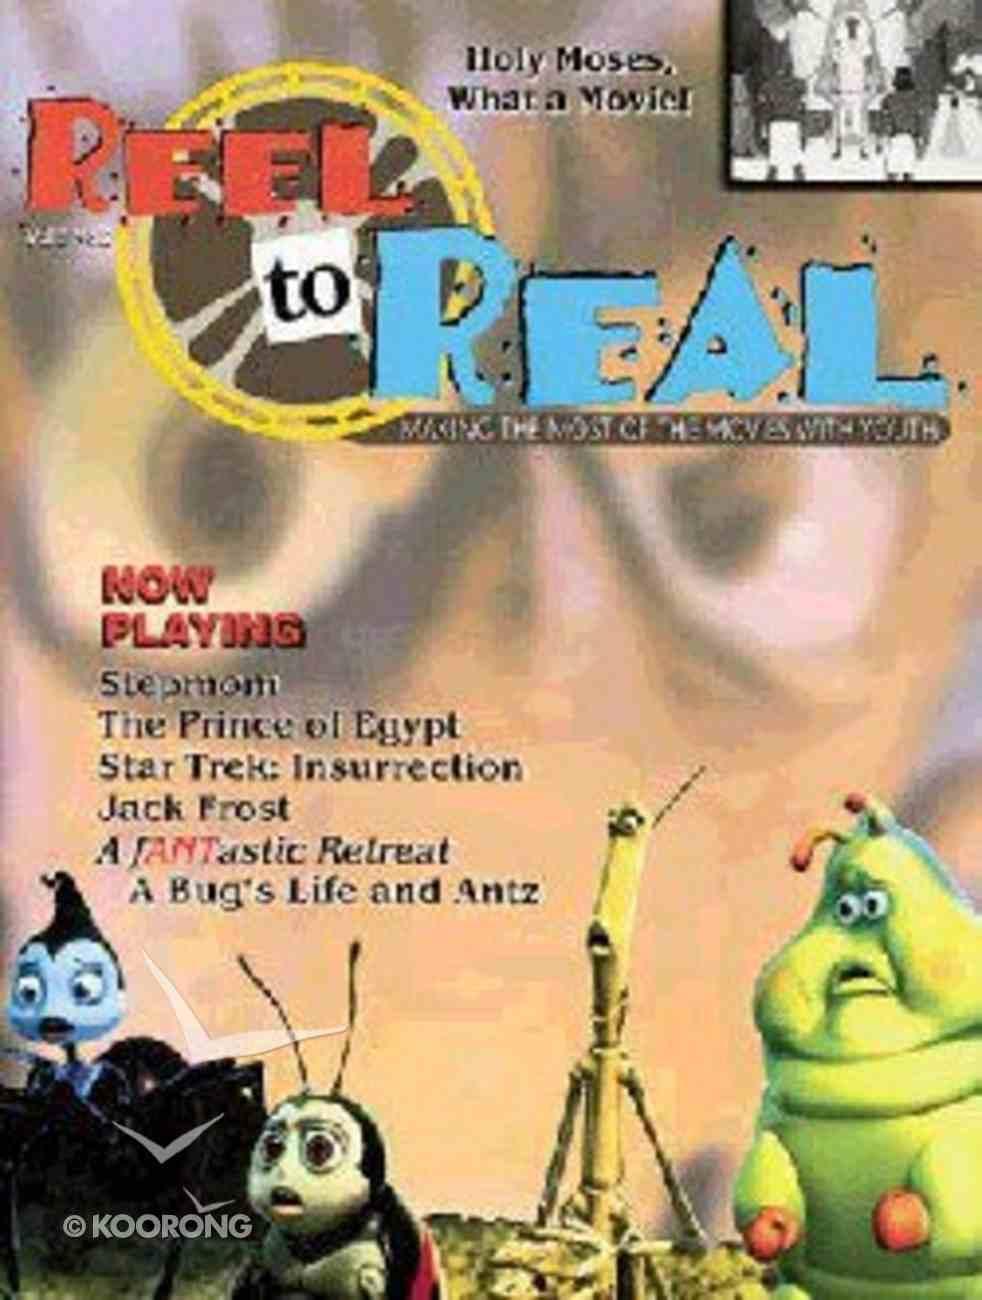 Reel to Real (Vol 3 #2) Paperback